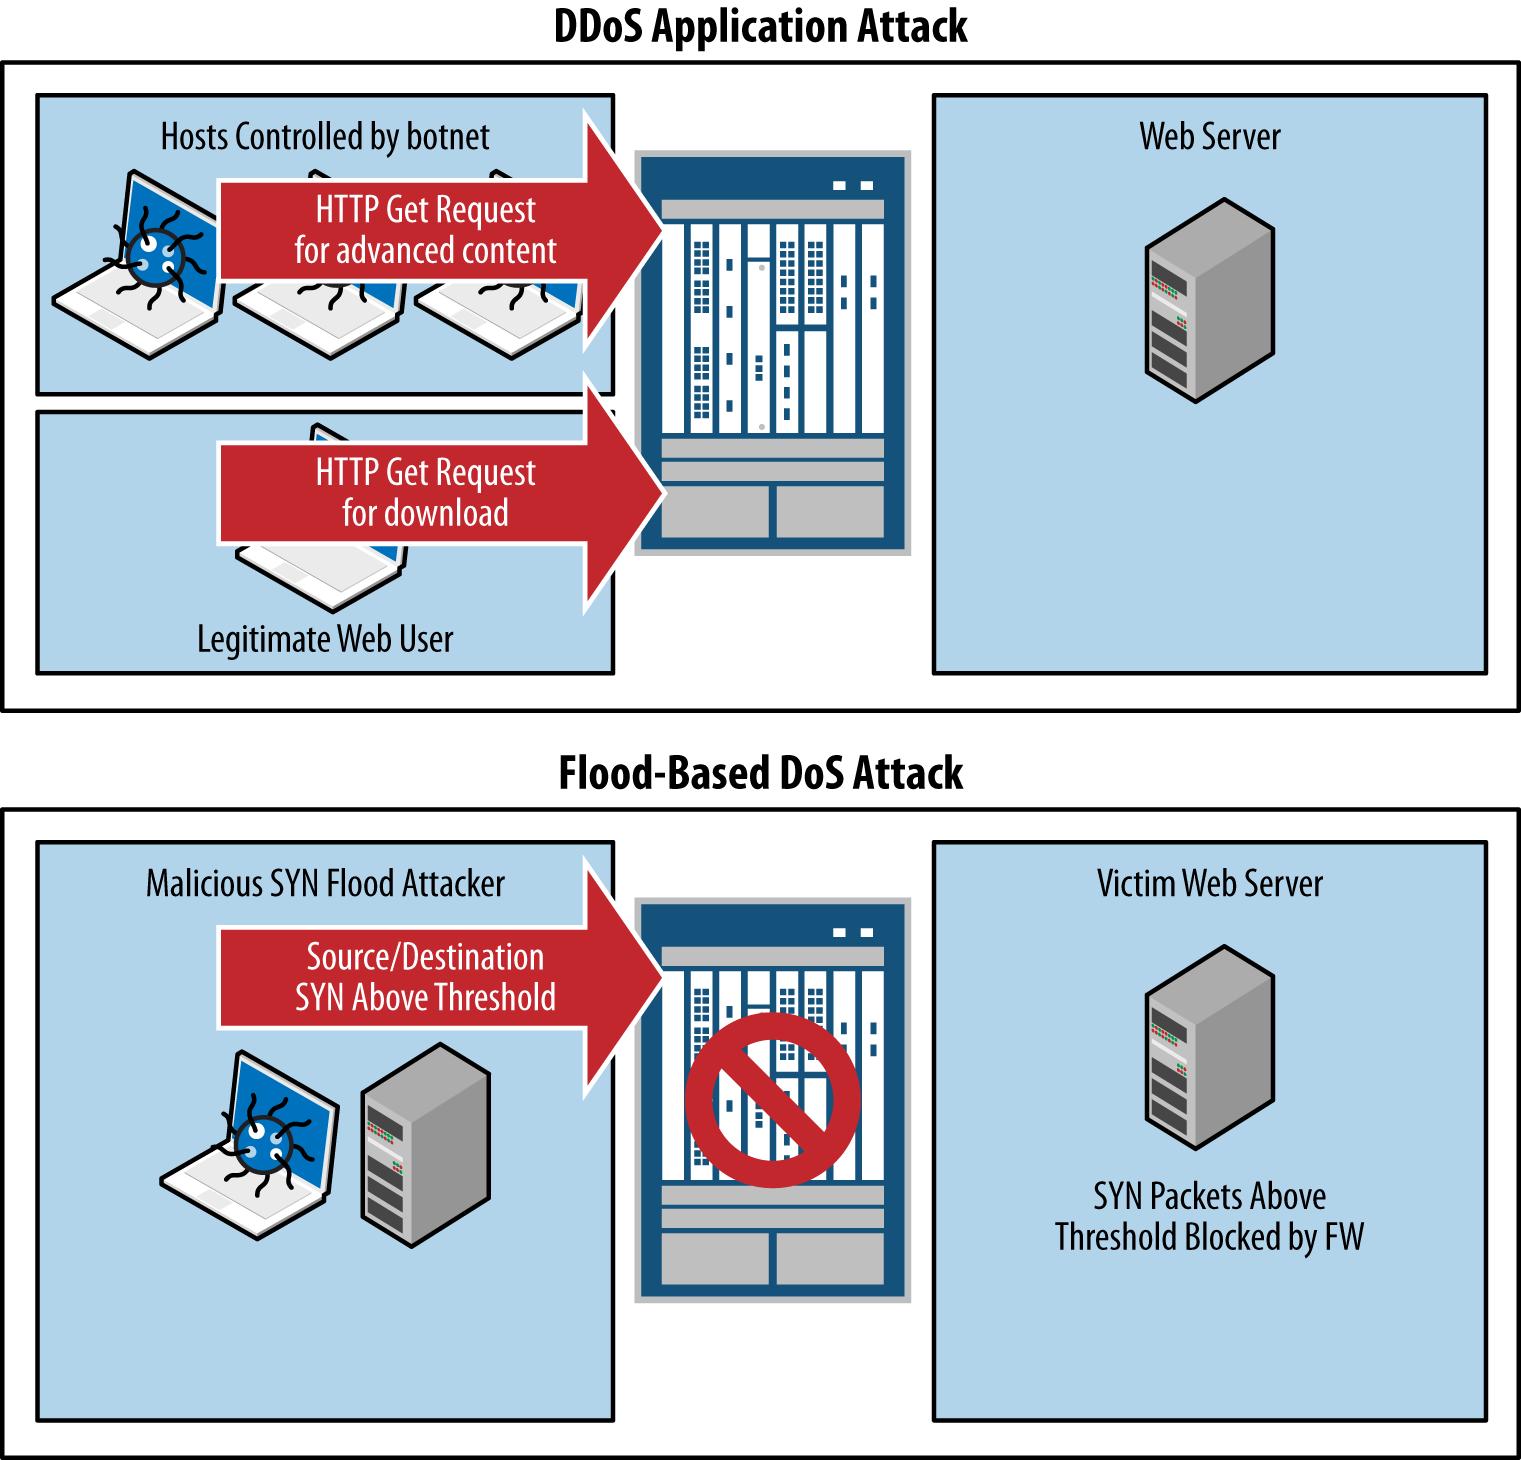 Flood-based DoS attack